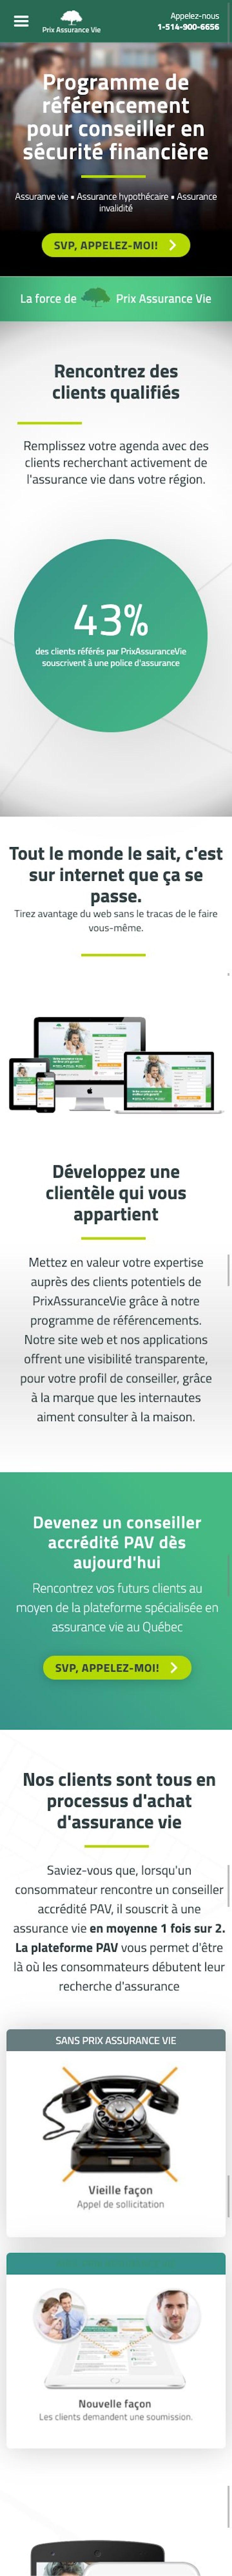 webflow project 4 - Prix Assurance Vie